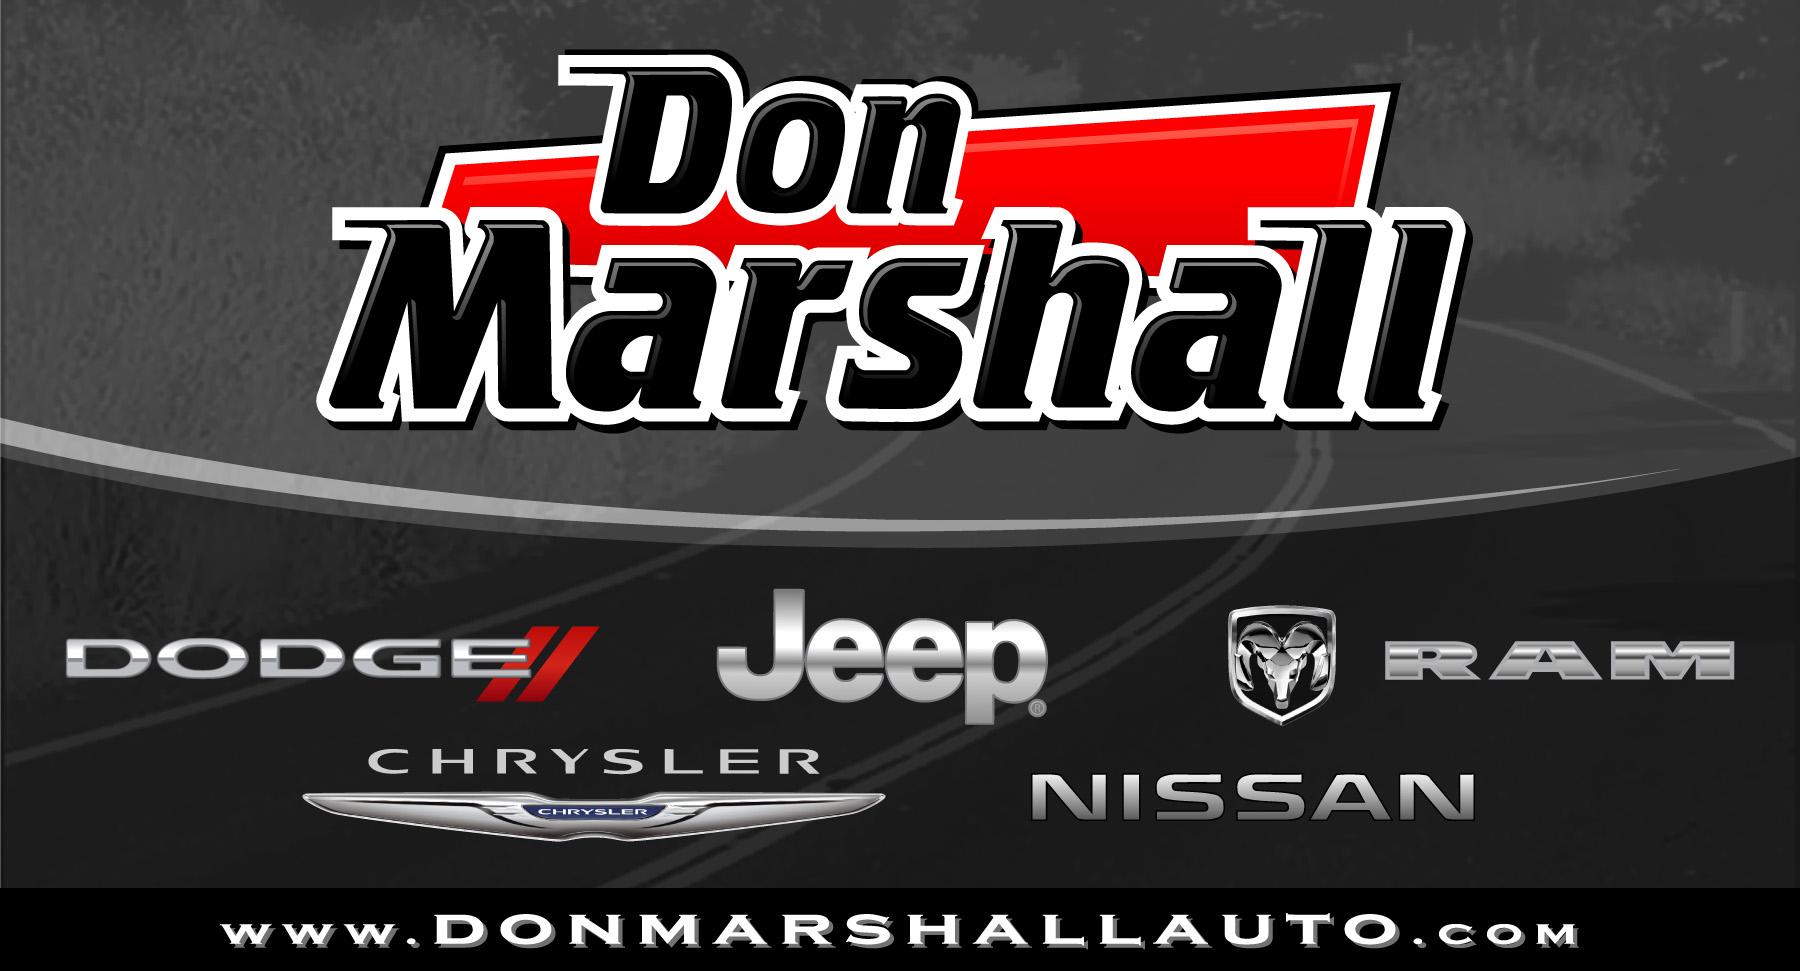 Car Dealerships In Somerset Ky >> Don Marshall Nissan Somerset Ky | Upcomingcarshq.com